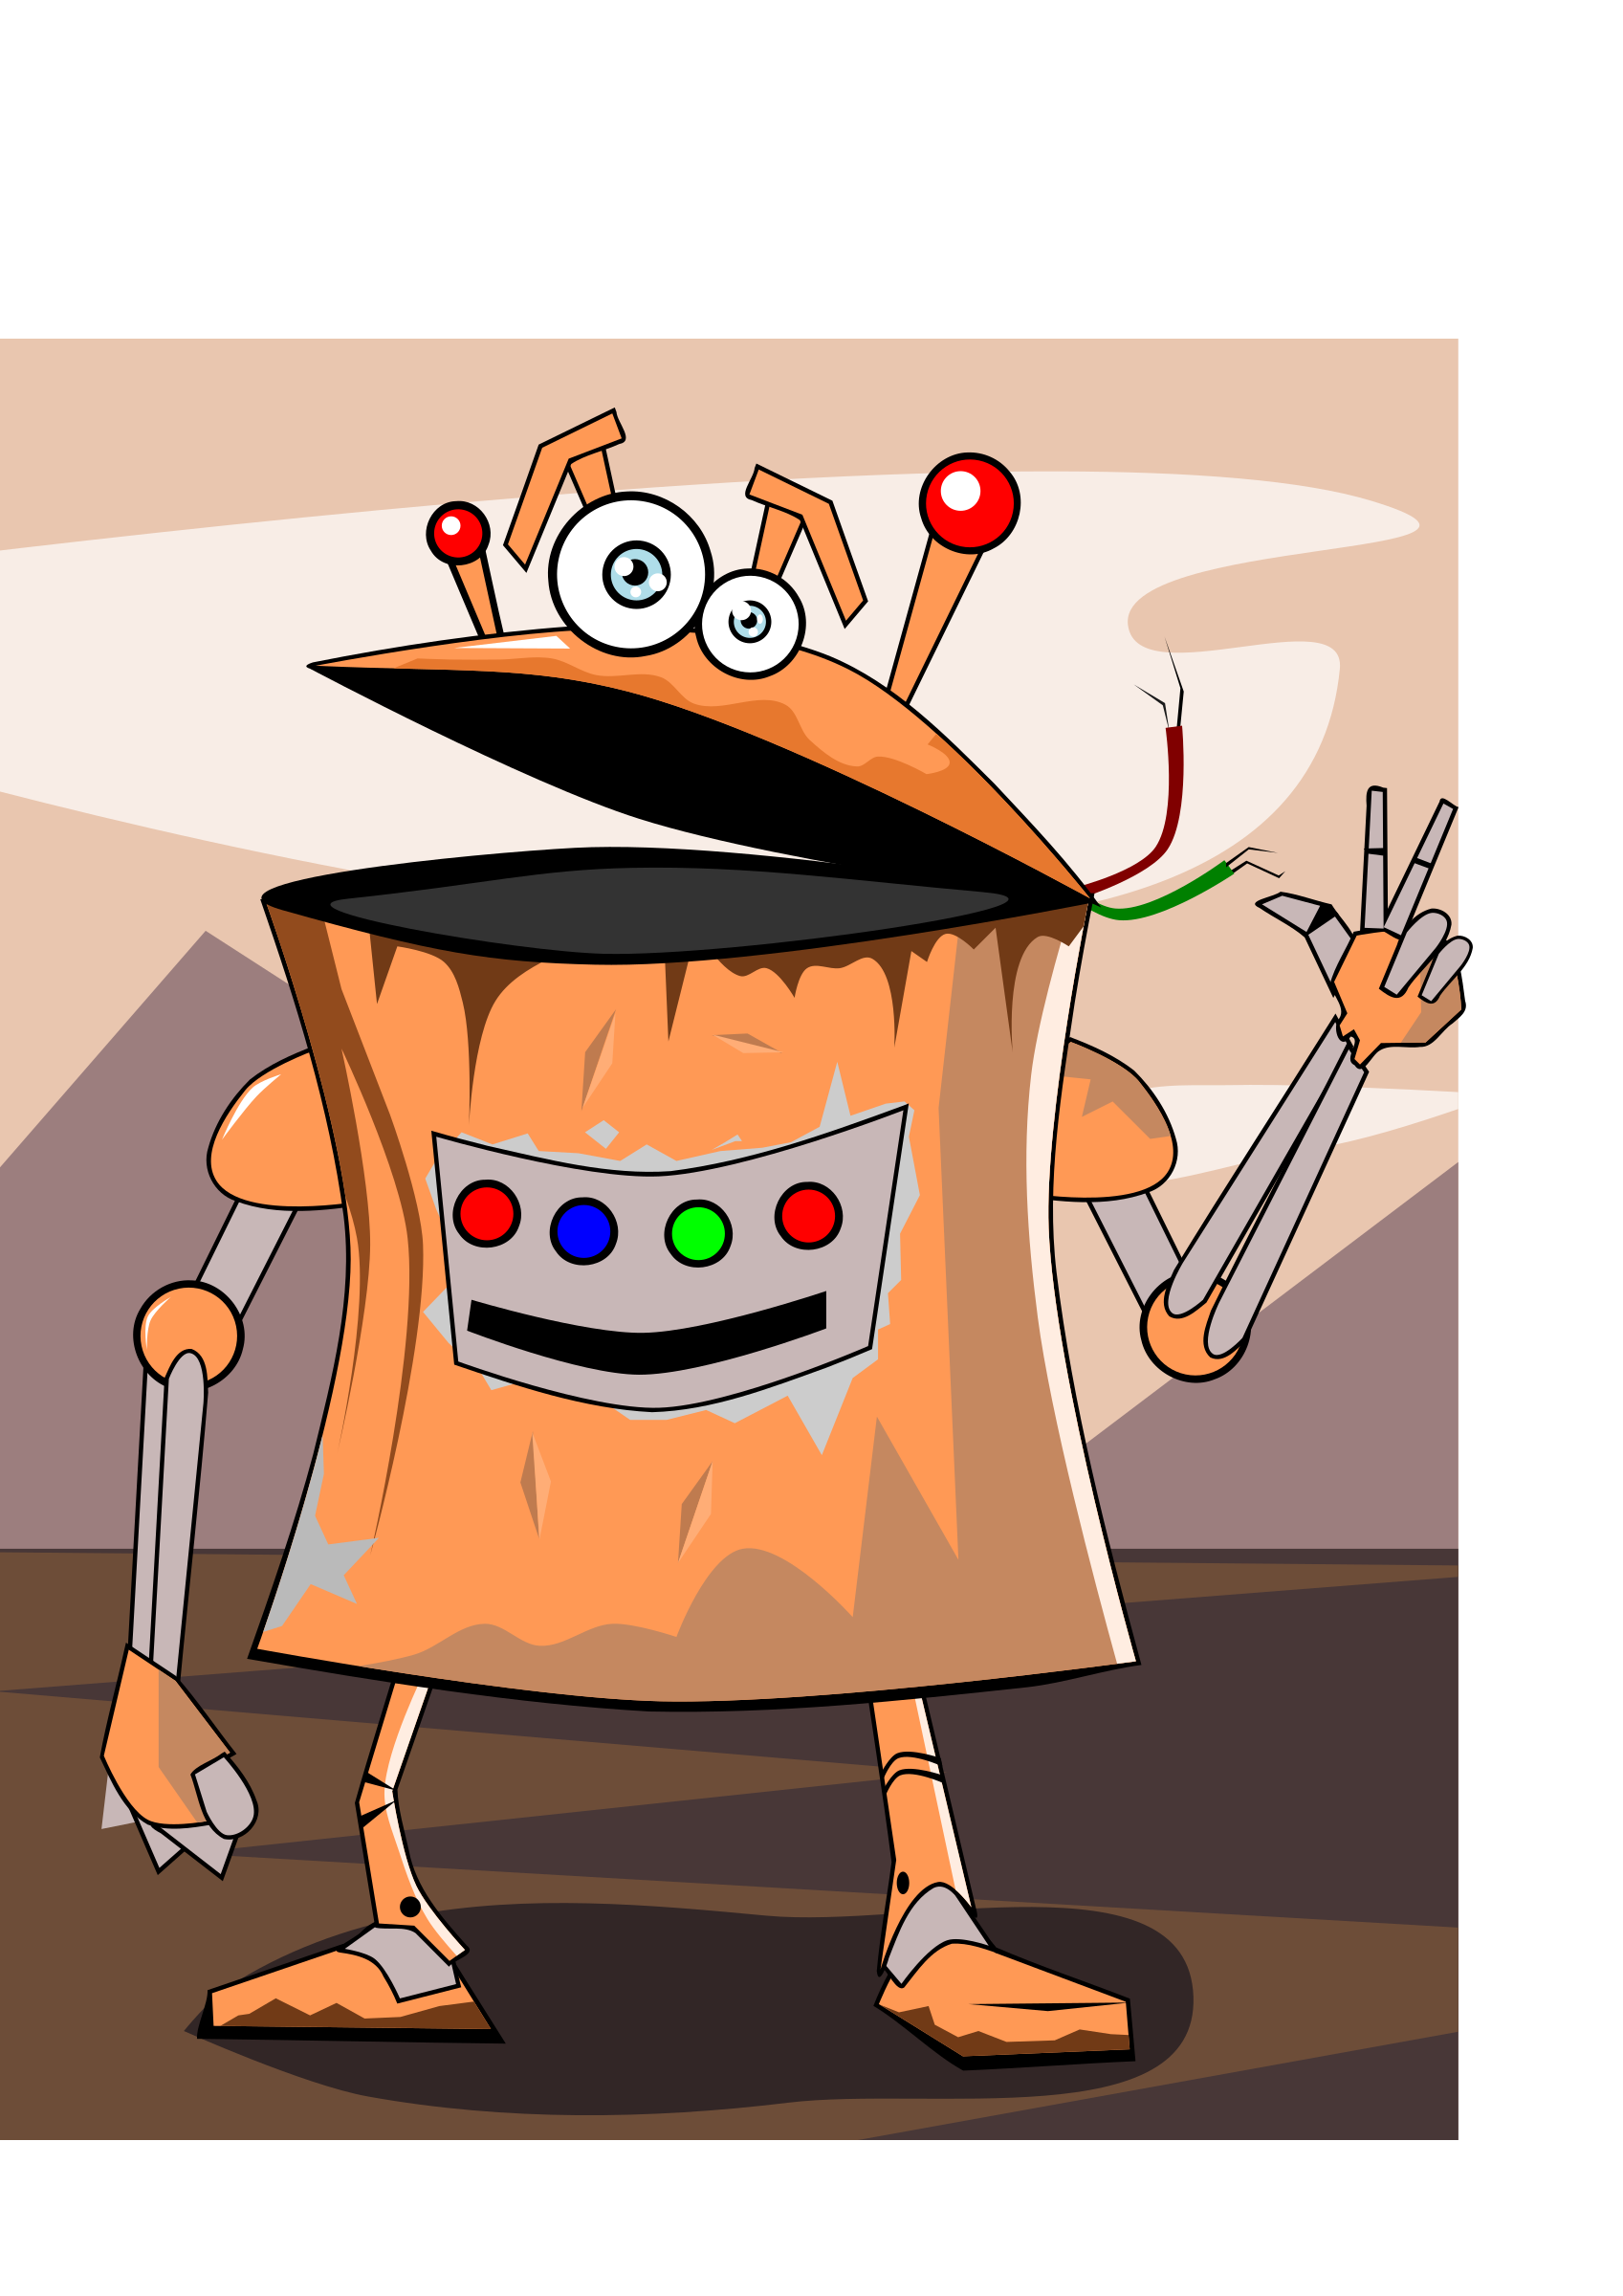 Geometry clipart cartoon. Rusty robot big image